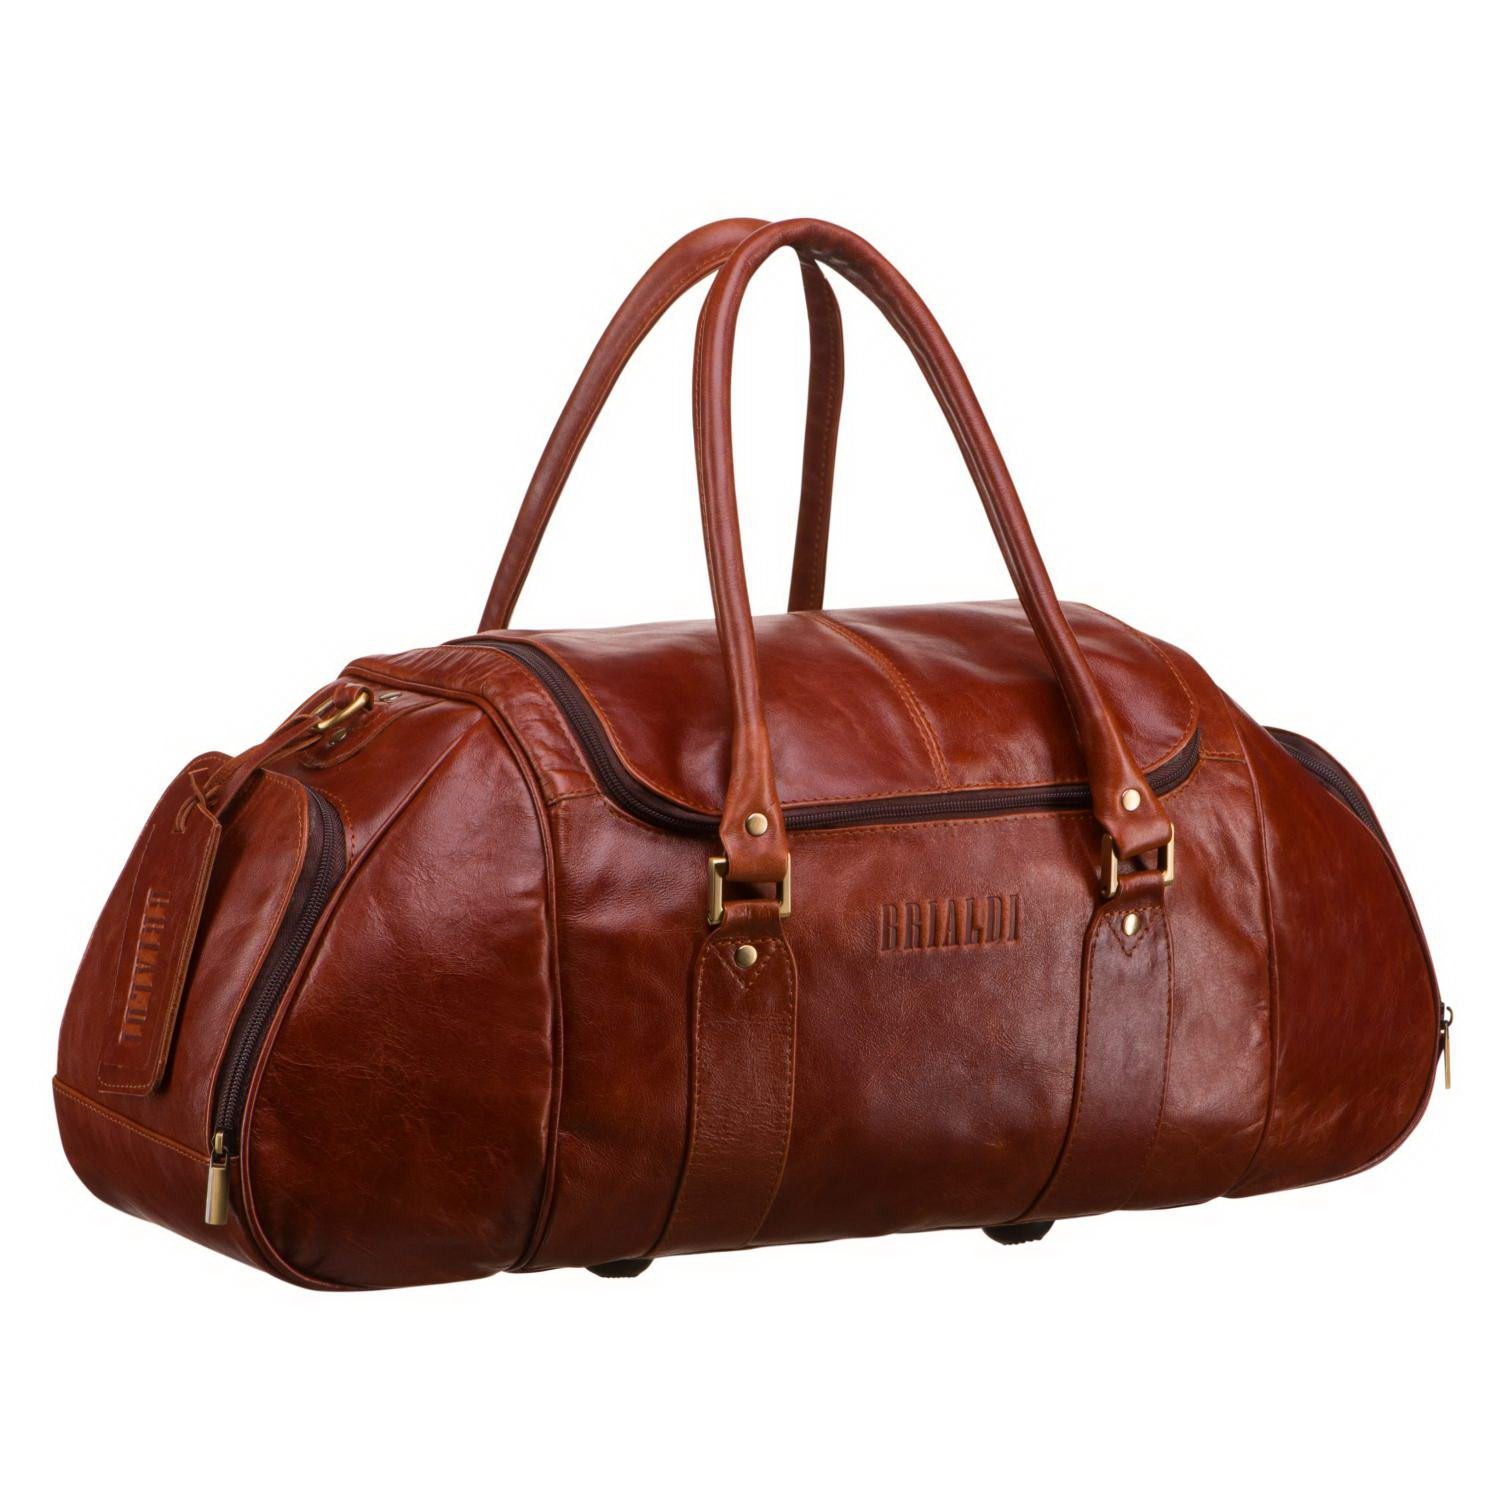 33cce31e Brialdi Modena (Модена) red Дорожная сумка